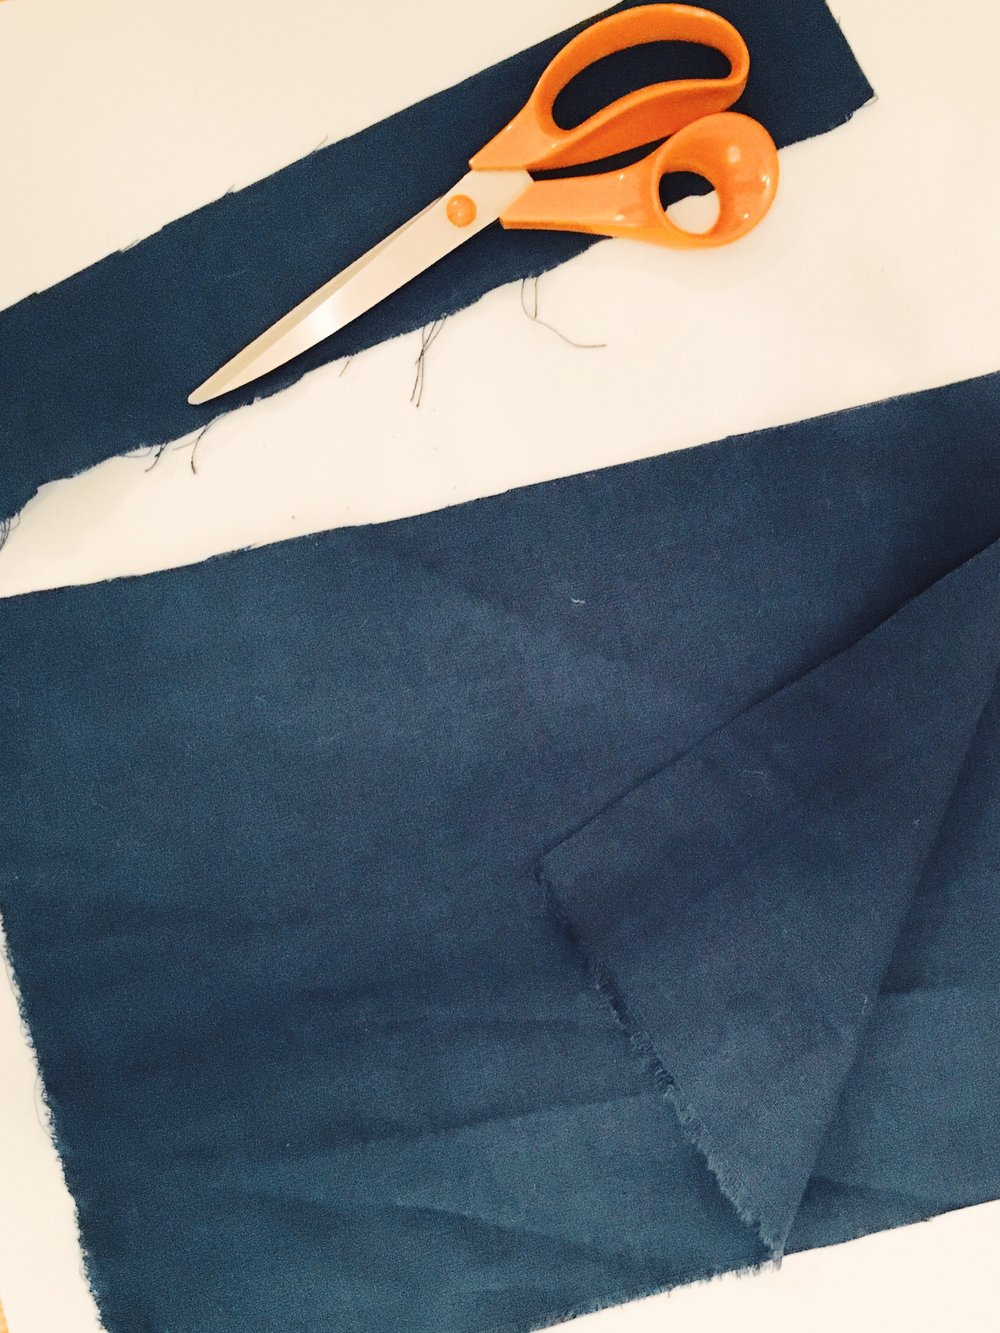 cut fabric.JPG